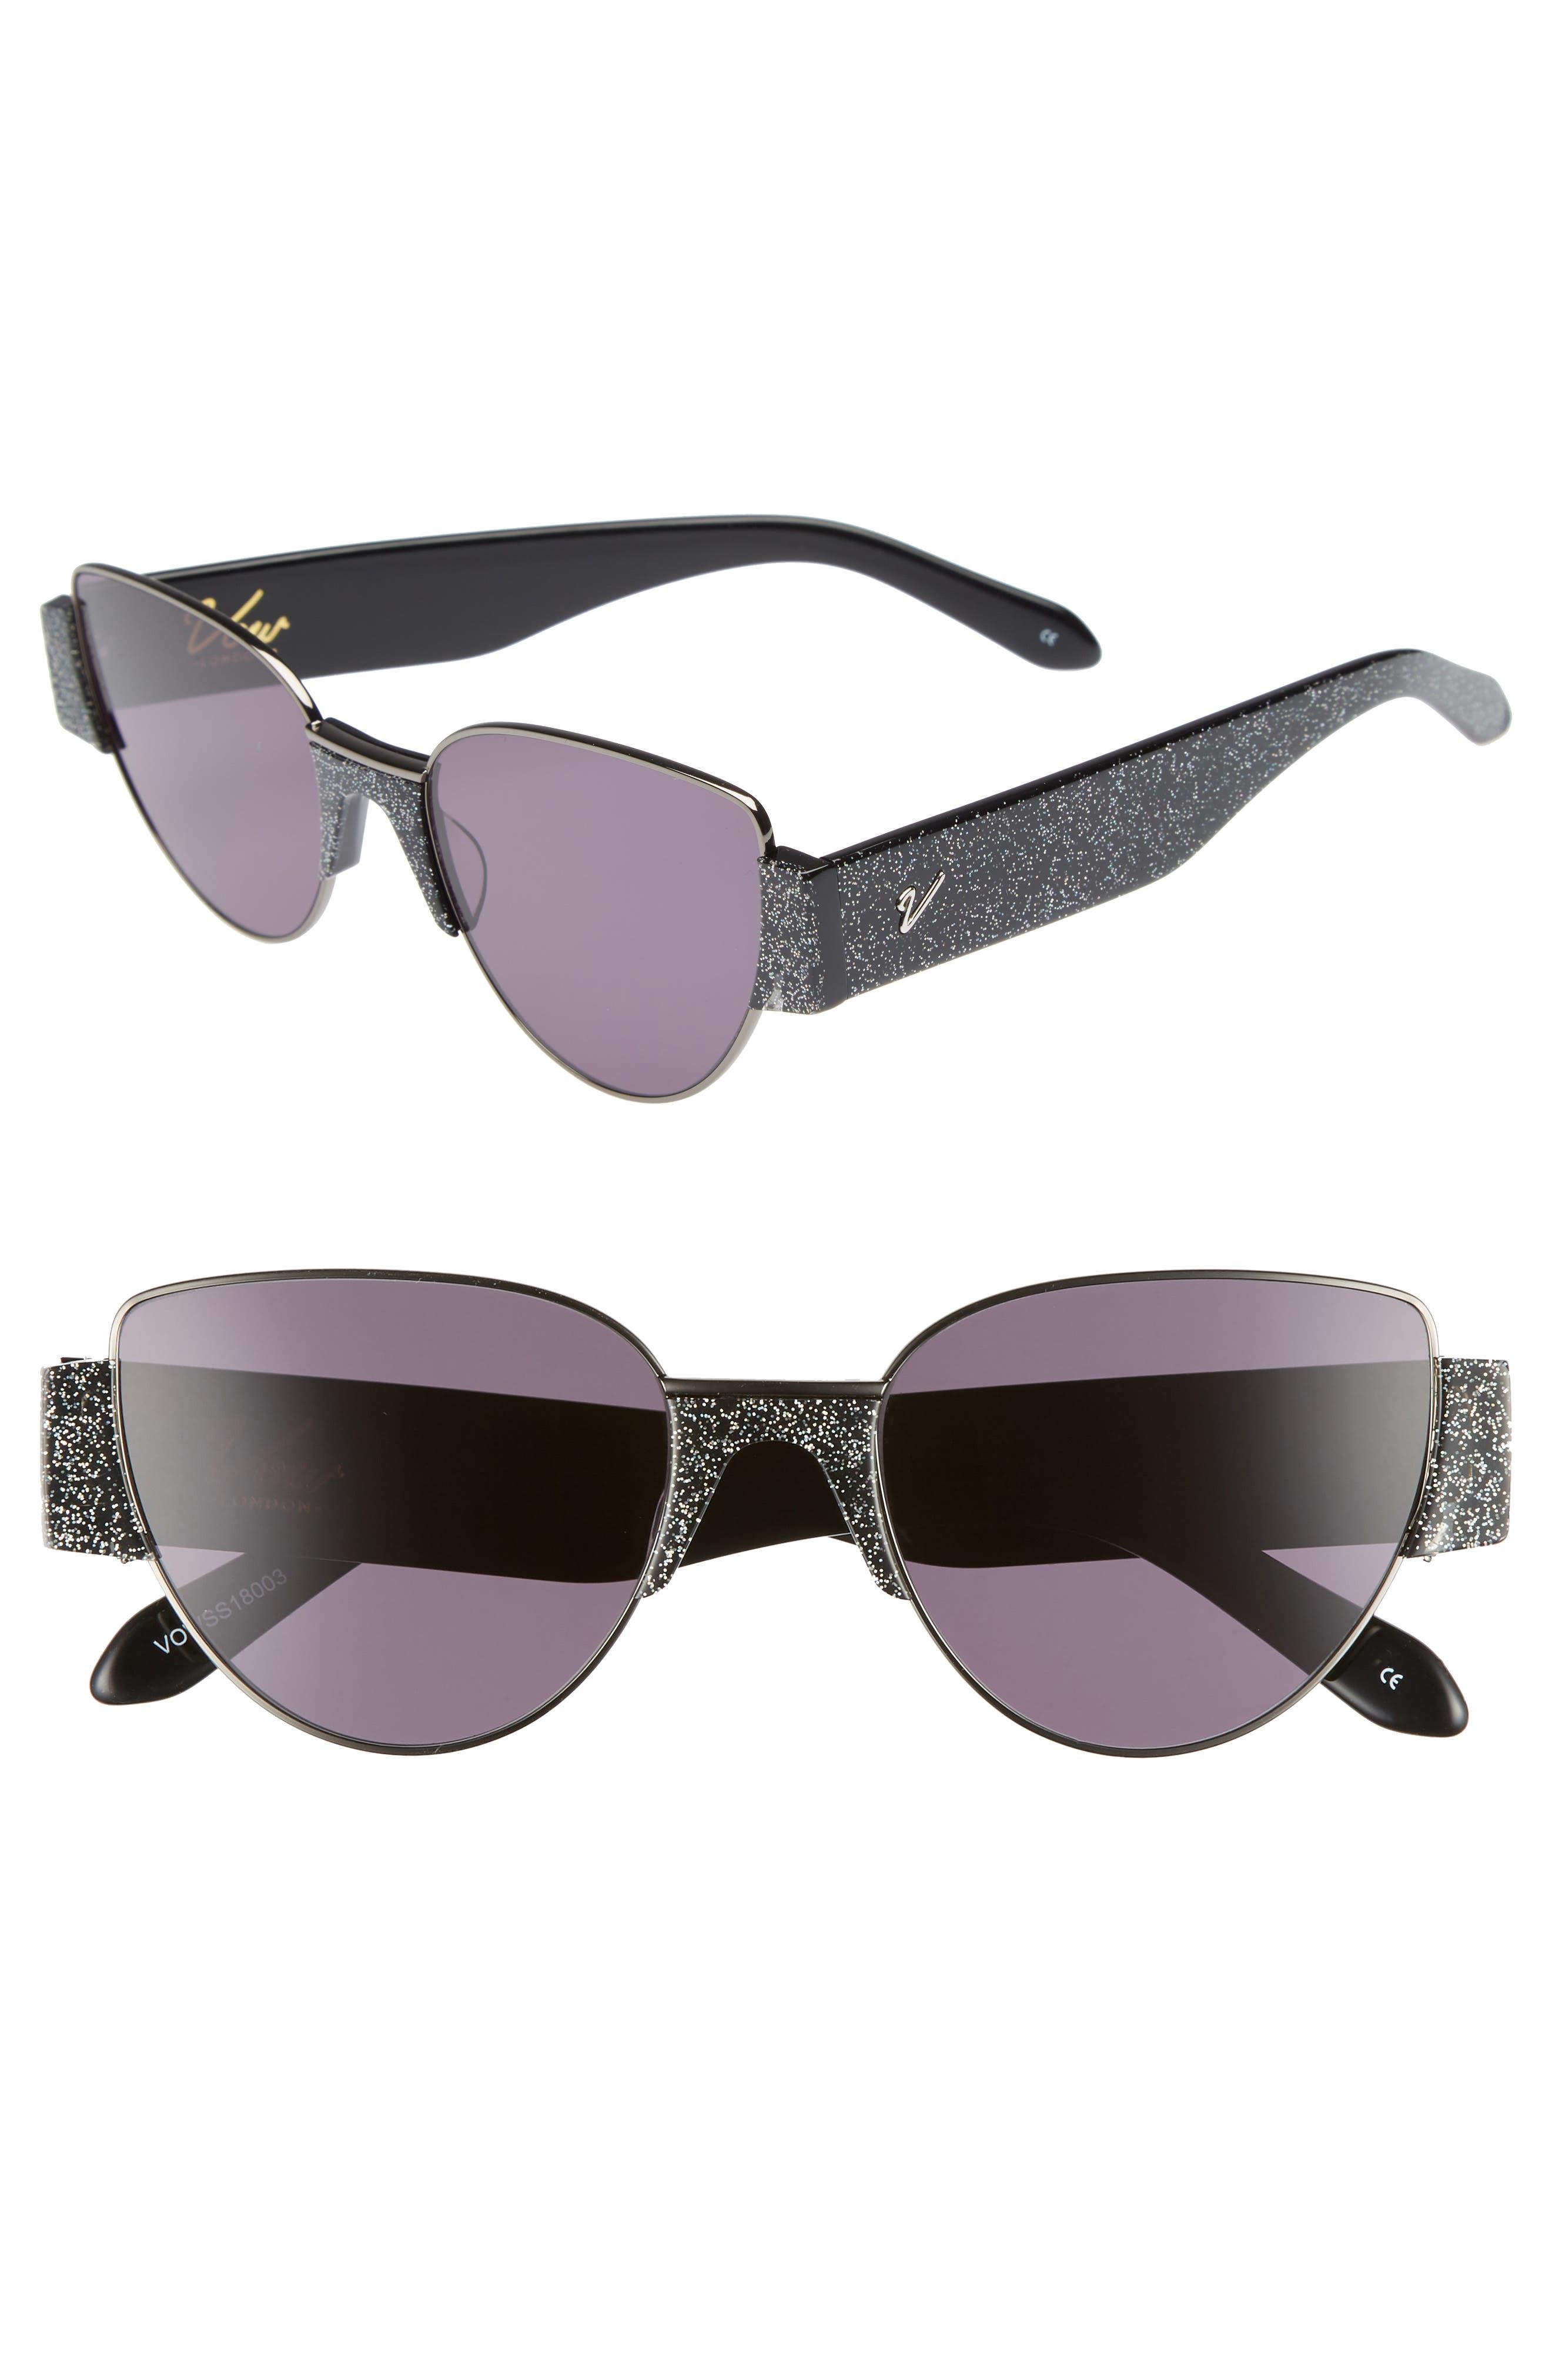 Dahlia 55mm Cat Eye Sunglasses,                         Main,                         color, MULTI GLITTER/ GUNMETAL/ SMOKE